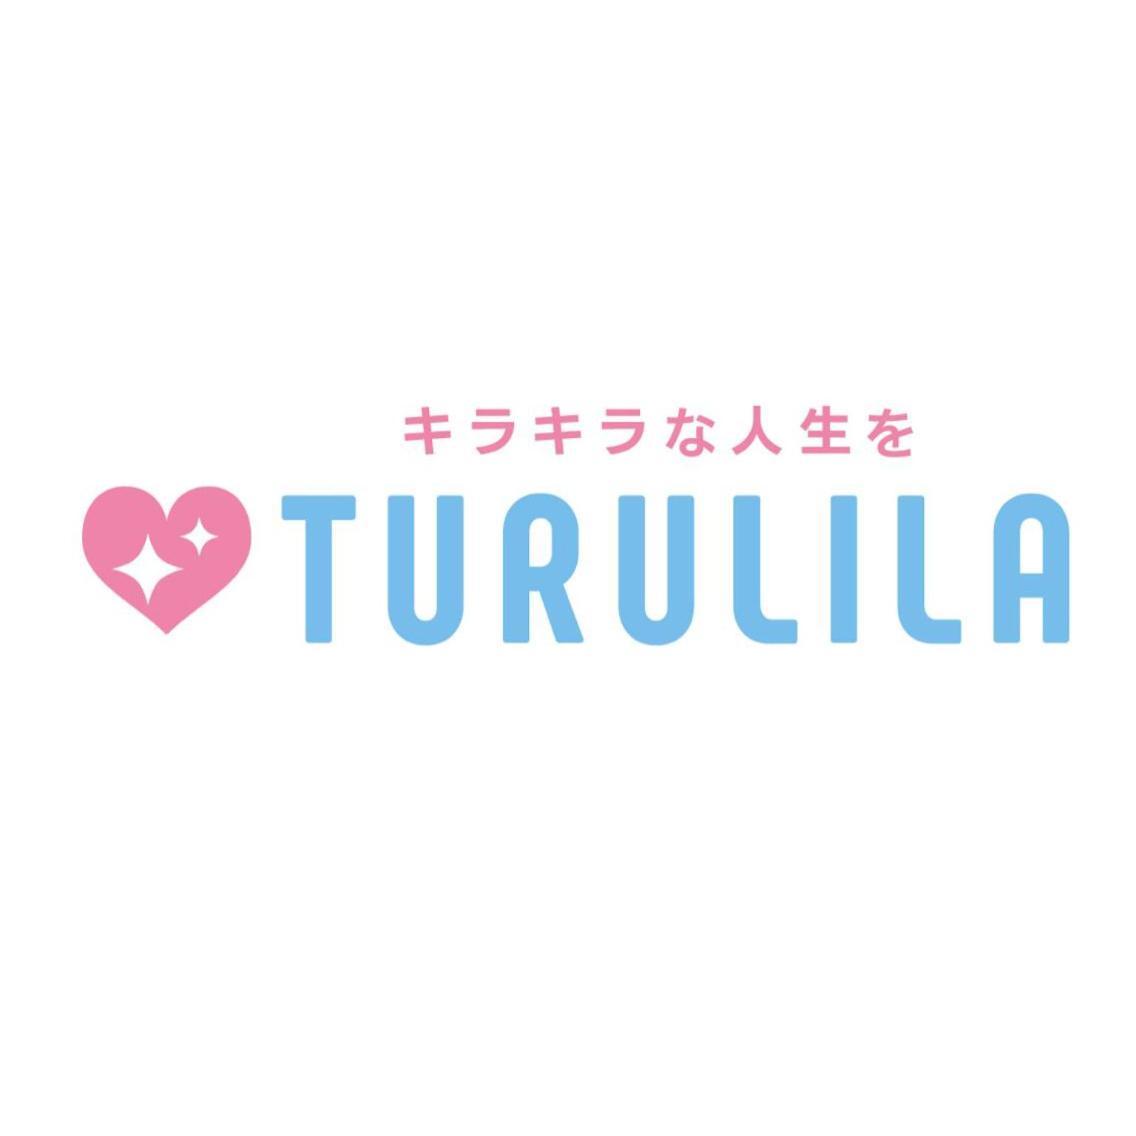 TURULILA博多駅前店所属・TURULILA全身脱毛の掲載